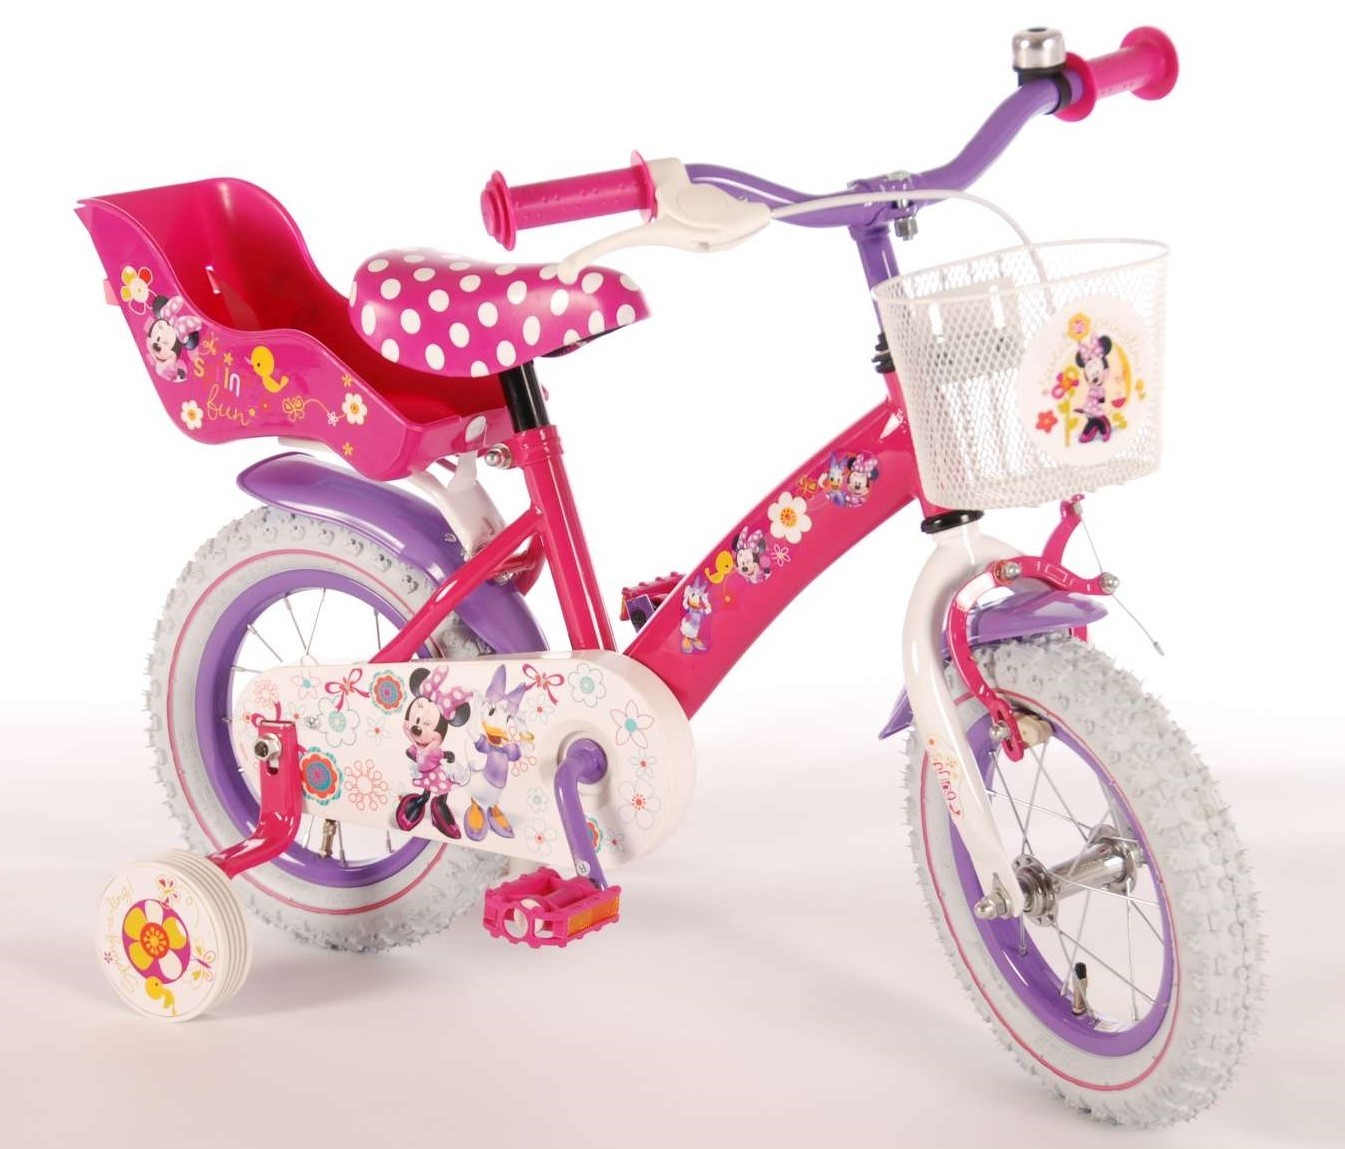 Disney Minnie Bow-Tique 12 inch meisjesfiets 31226